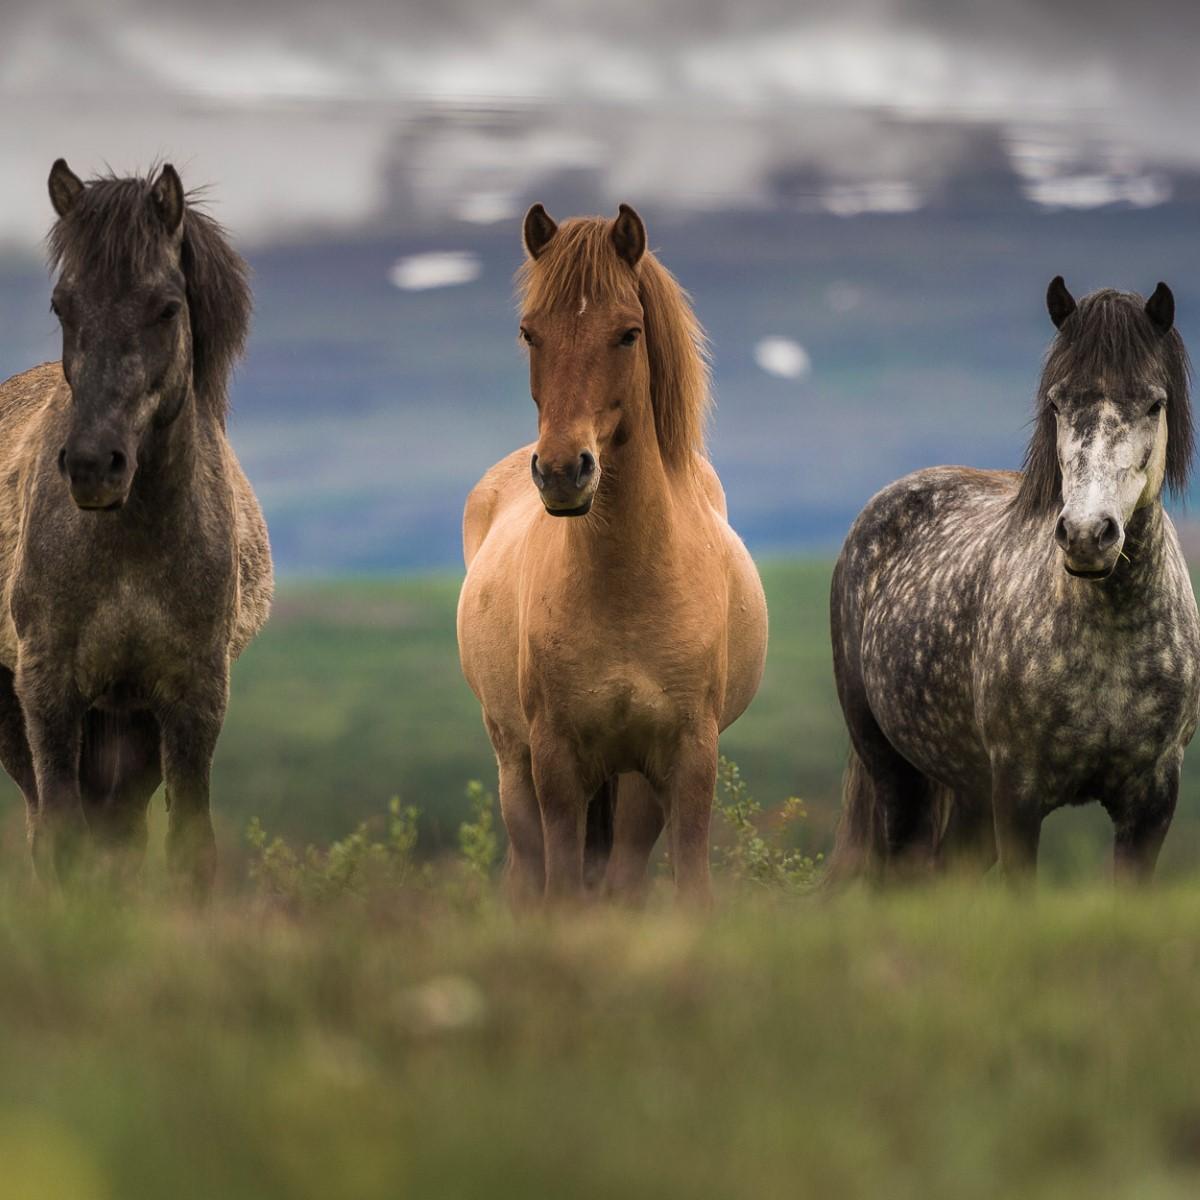 Global Views Horse: Horseback Riding In Ƿingeyri